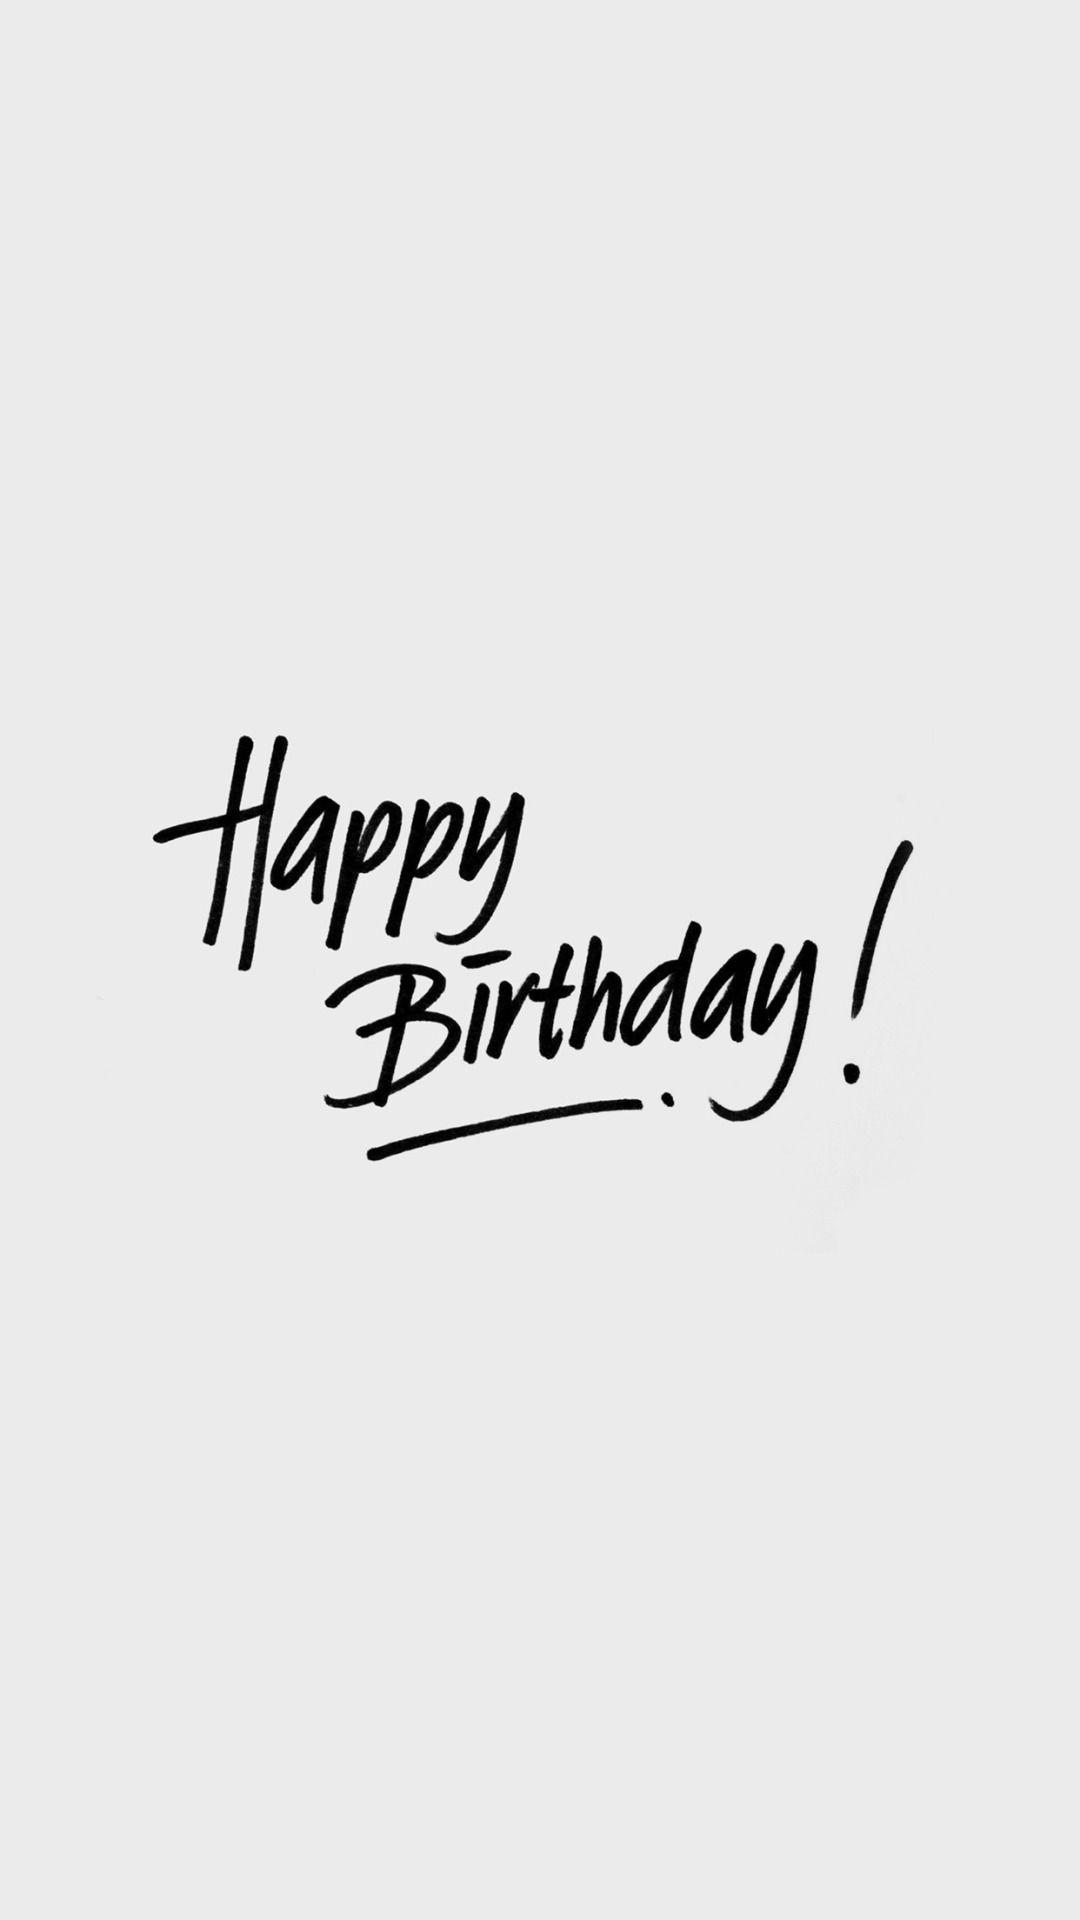 Mobile Wallpapers Happy Birthday White Event Writing Iphone6 Plus Wal Kartu Ulang Tahun Kutipan Ulang Tahun Kartu